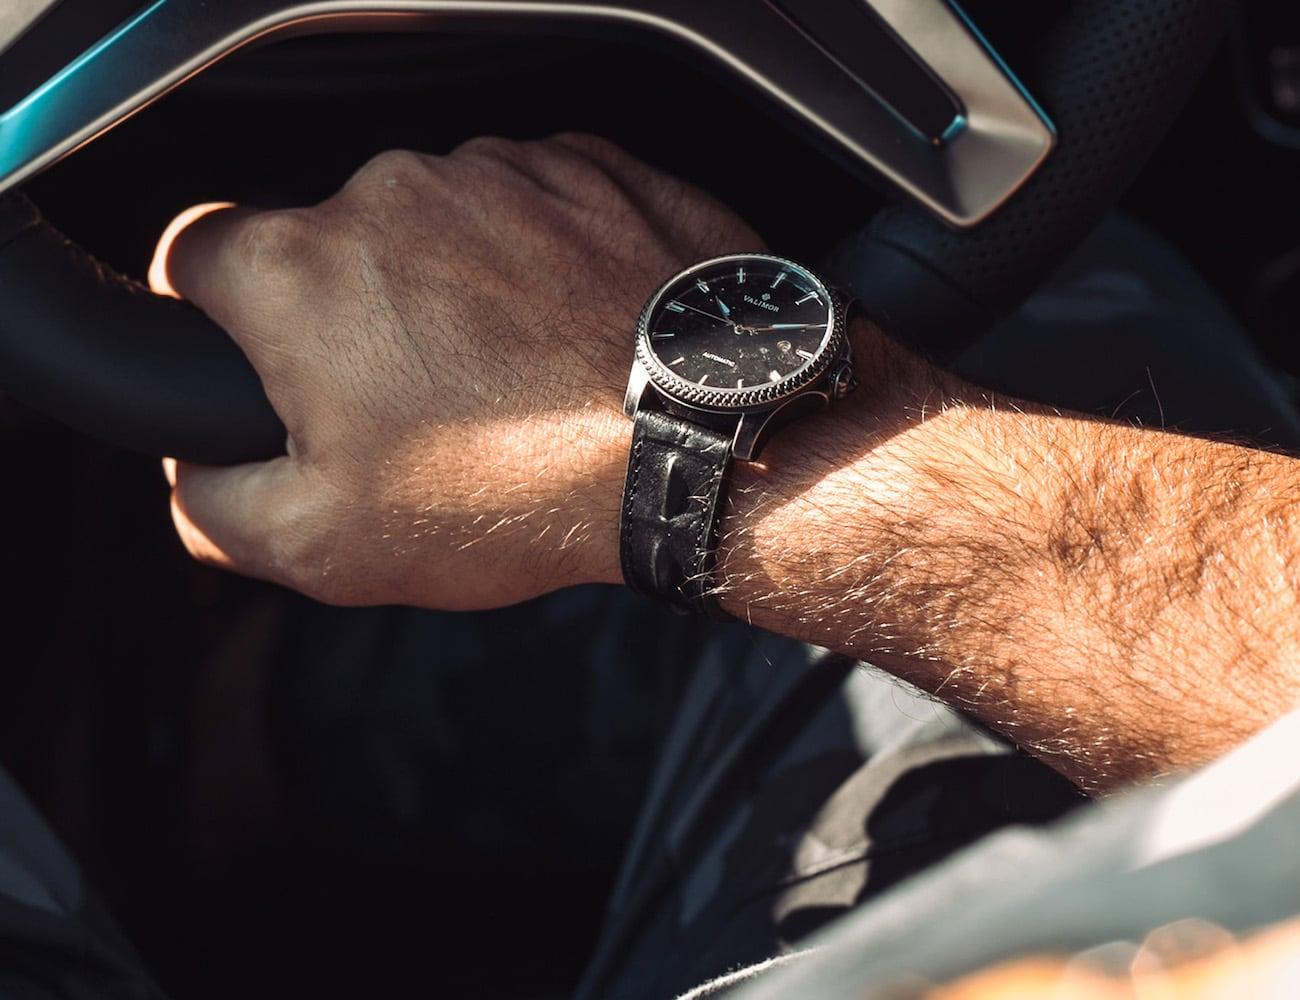 Valimor Caliburnus Hand-Tooled Automatic Watch